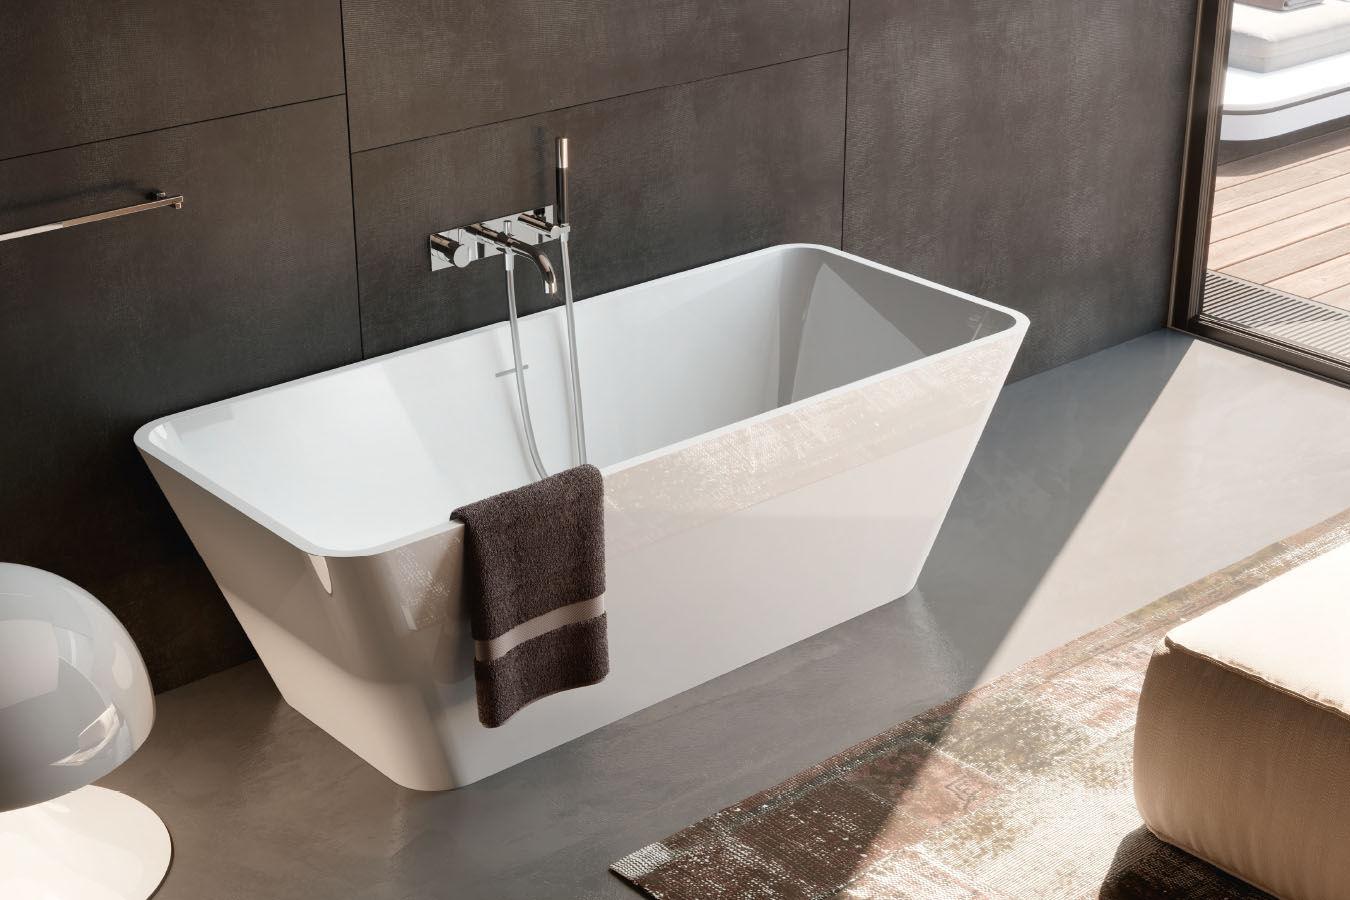 Vasche Da Bagno Treesse Listino Prezzi : Treesse vasche vasche da bagno edilceramiche di maccanò